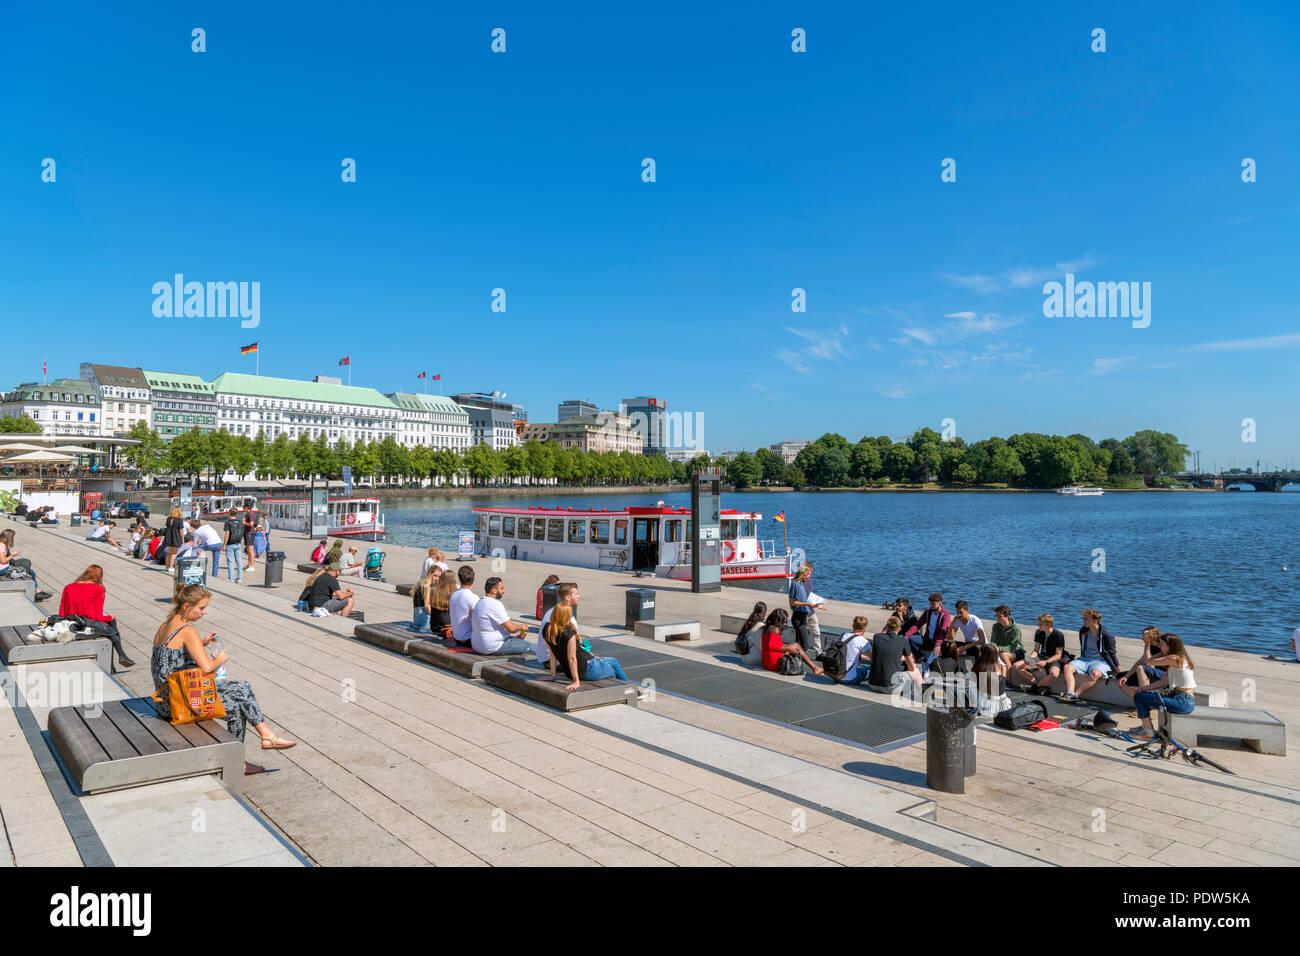 Tourists and tour boats on Binnenalster lake, Hamburg, Germany - Stock Image